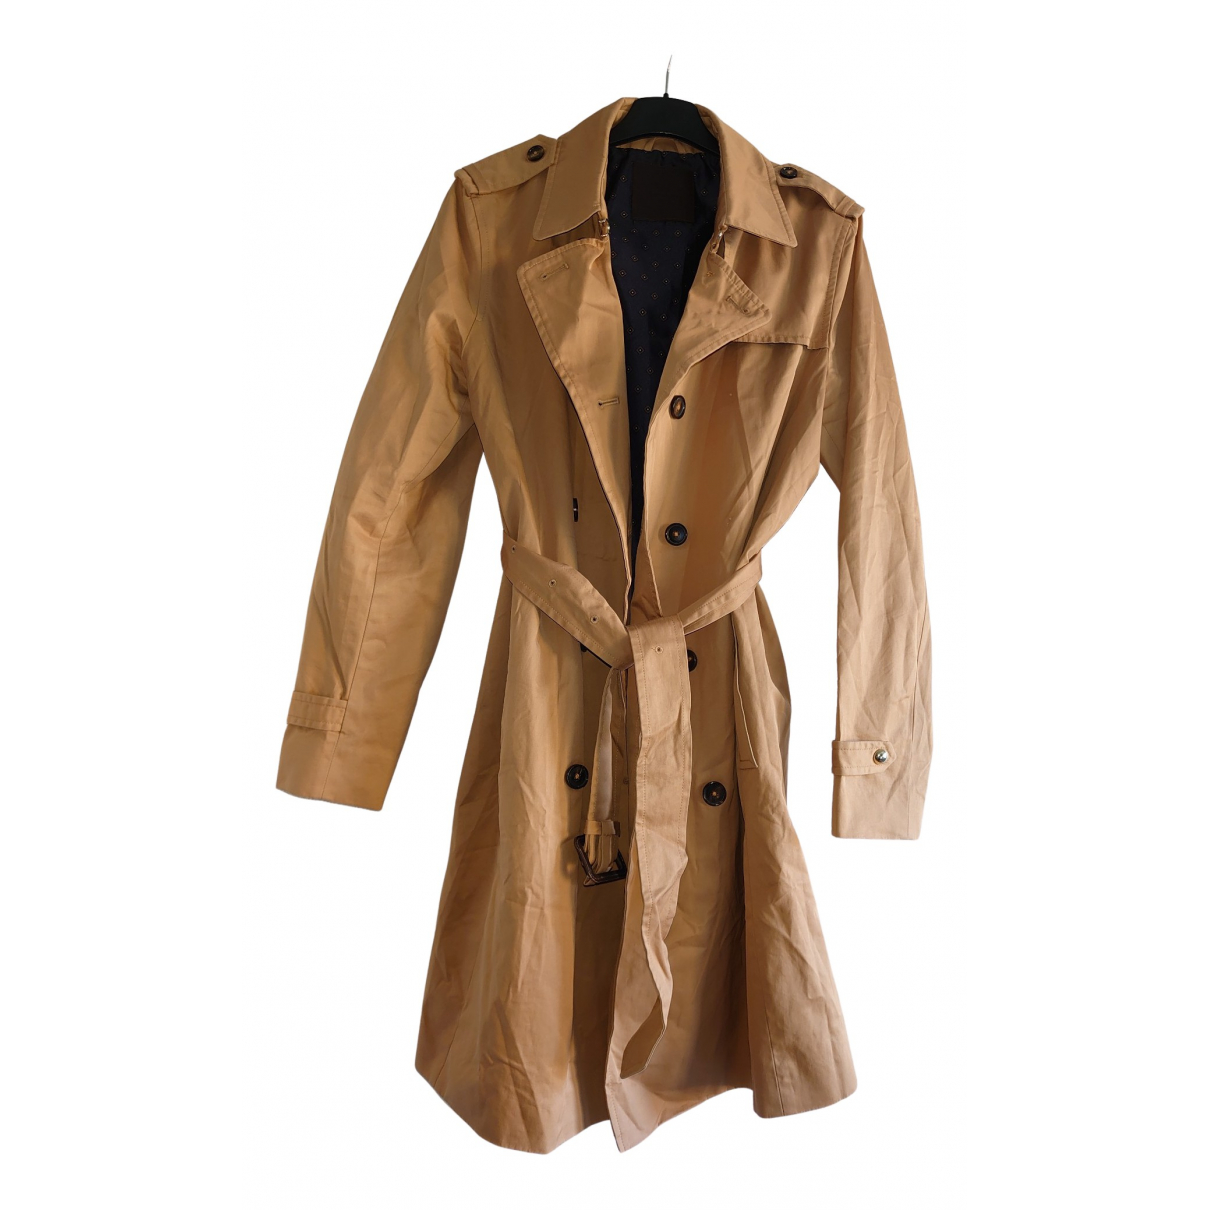 Massimo Dutti N Brown Cotton Trench coat for Women XL International